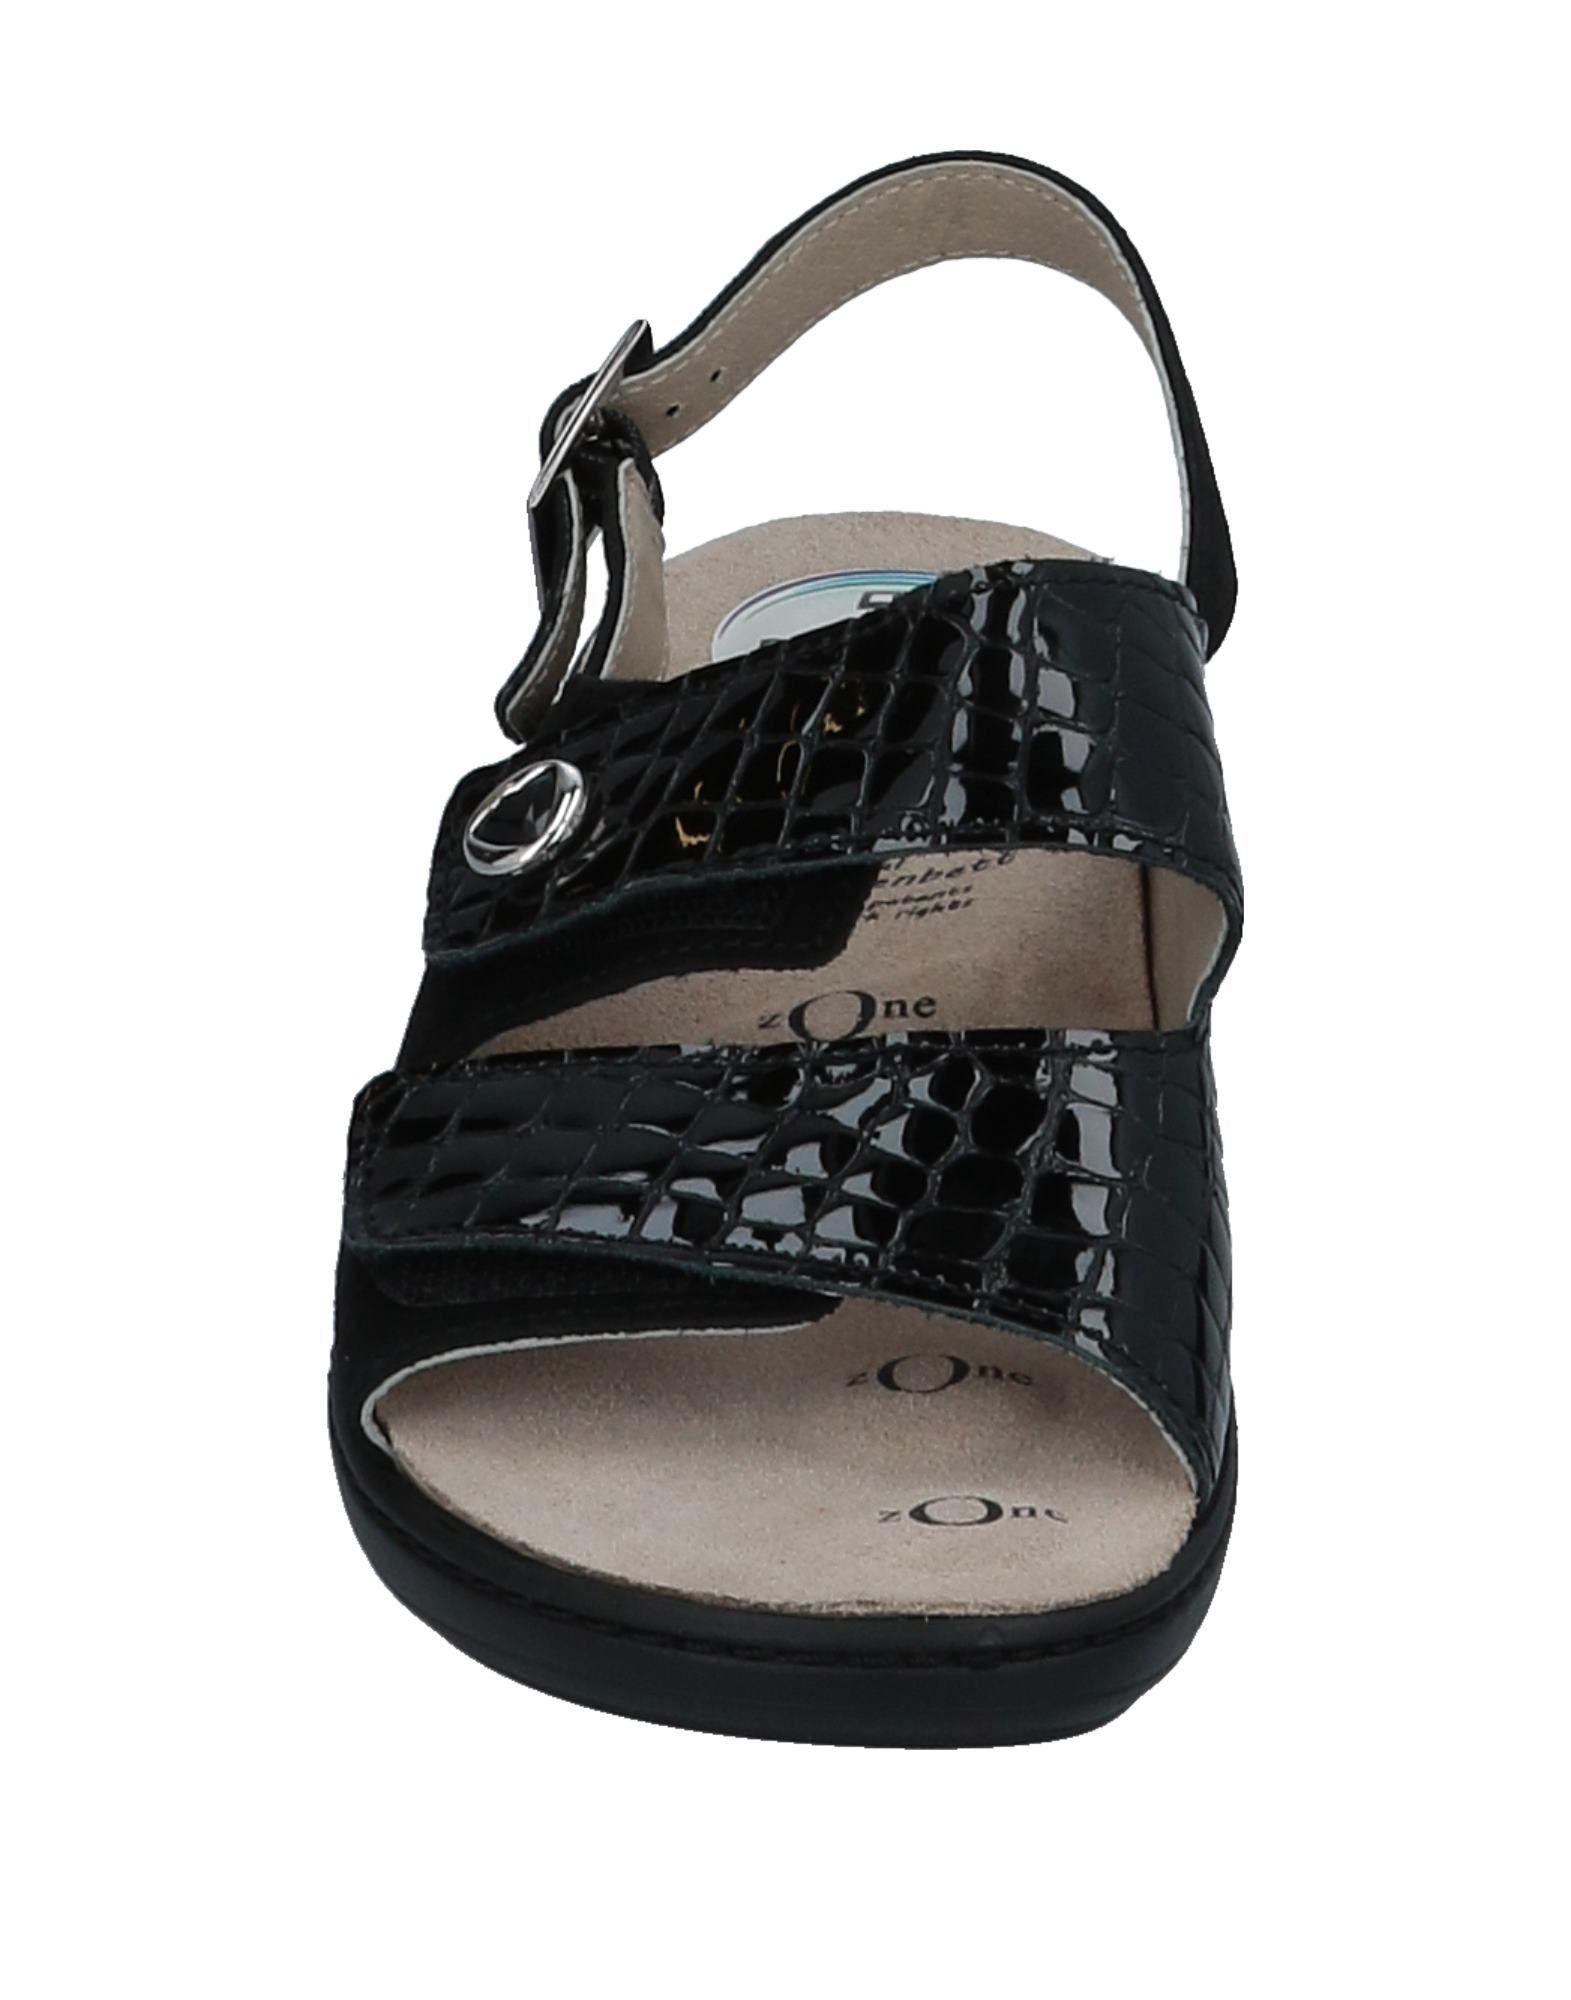 Walk By Melluso Sandalen Damen  11534247OR beliebte Gute Qualität beliebte 11534247OR Schuhe 19d020